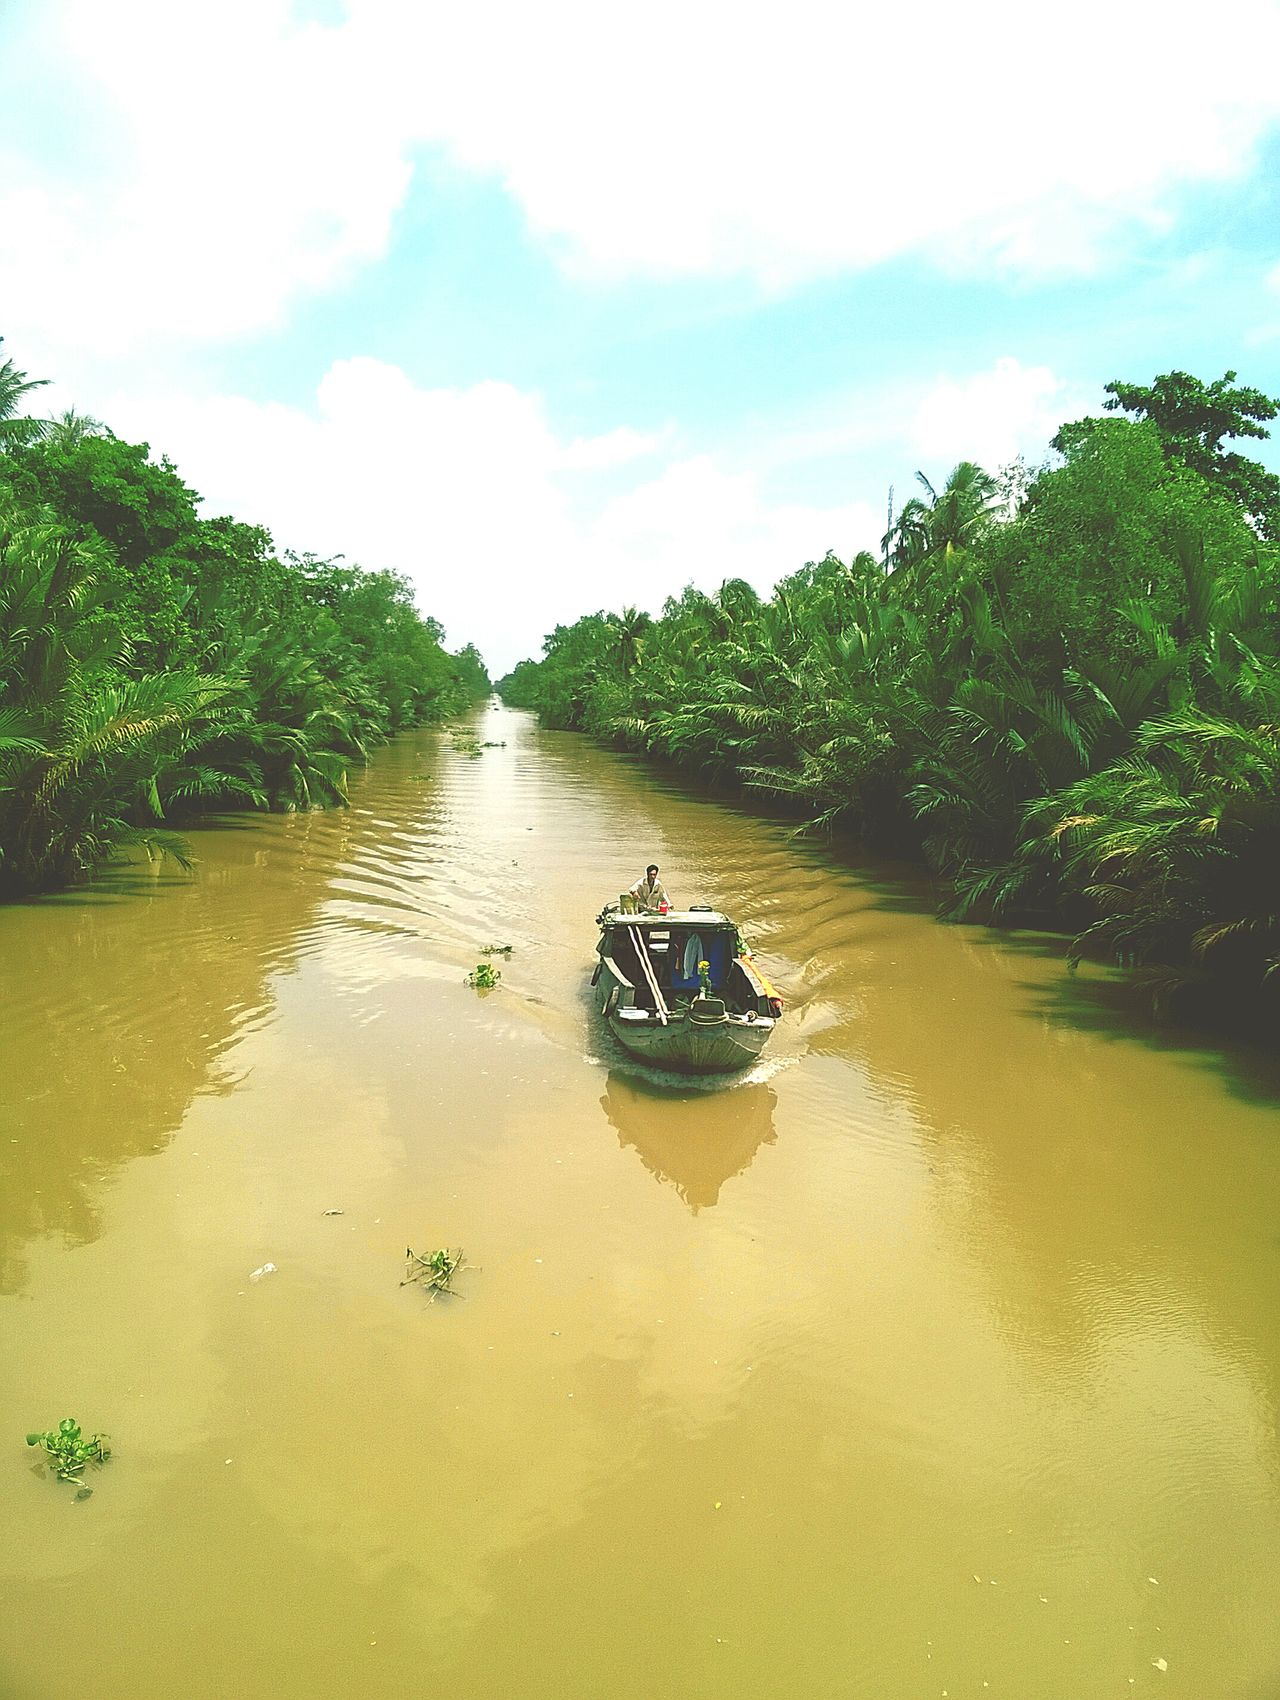 Vietnam Southernvietnam SocTrangProvince Beautiful Mekong River MekongDelta